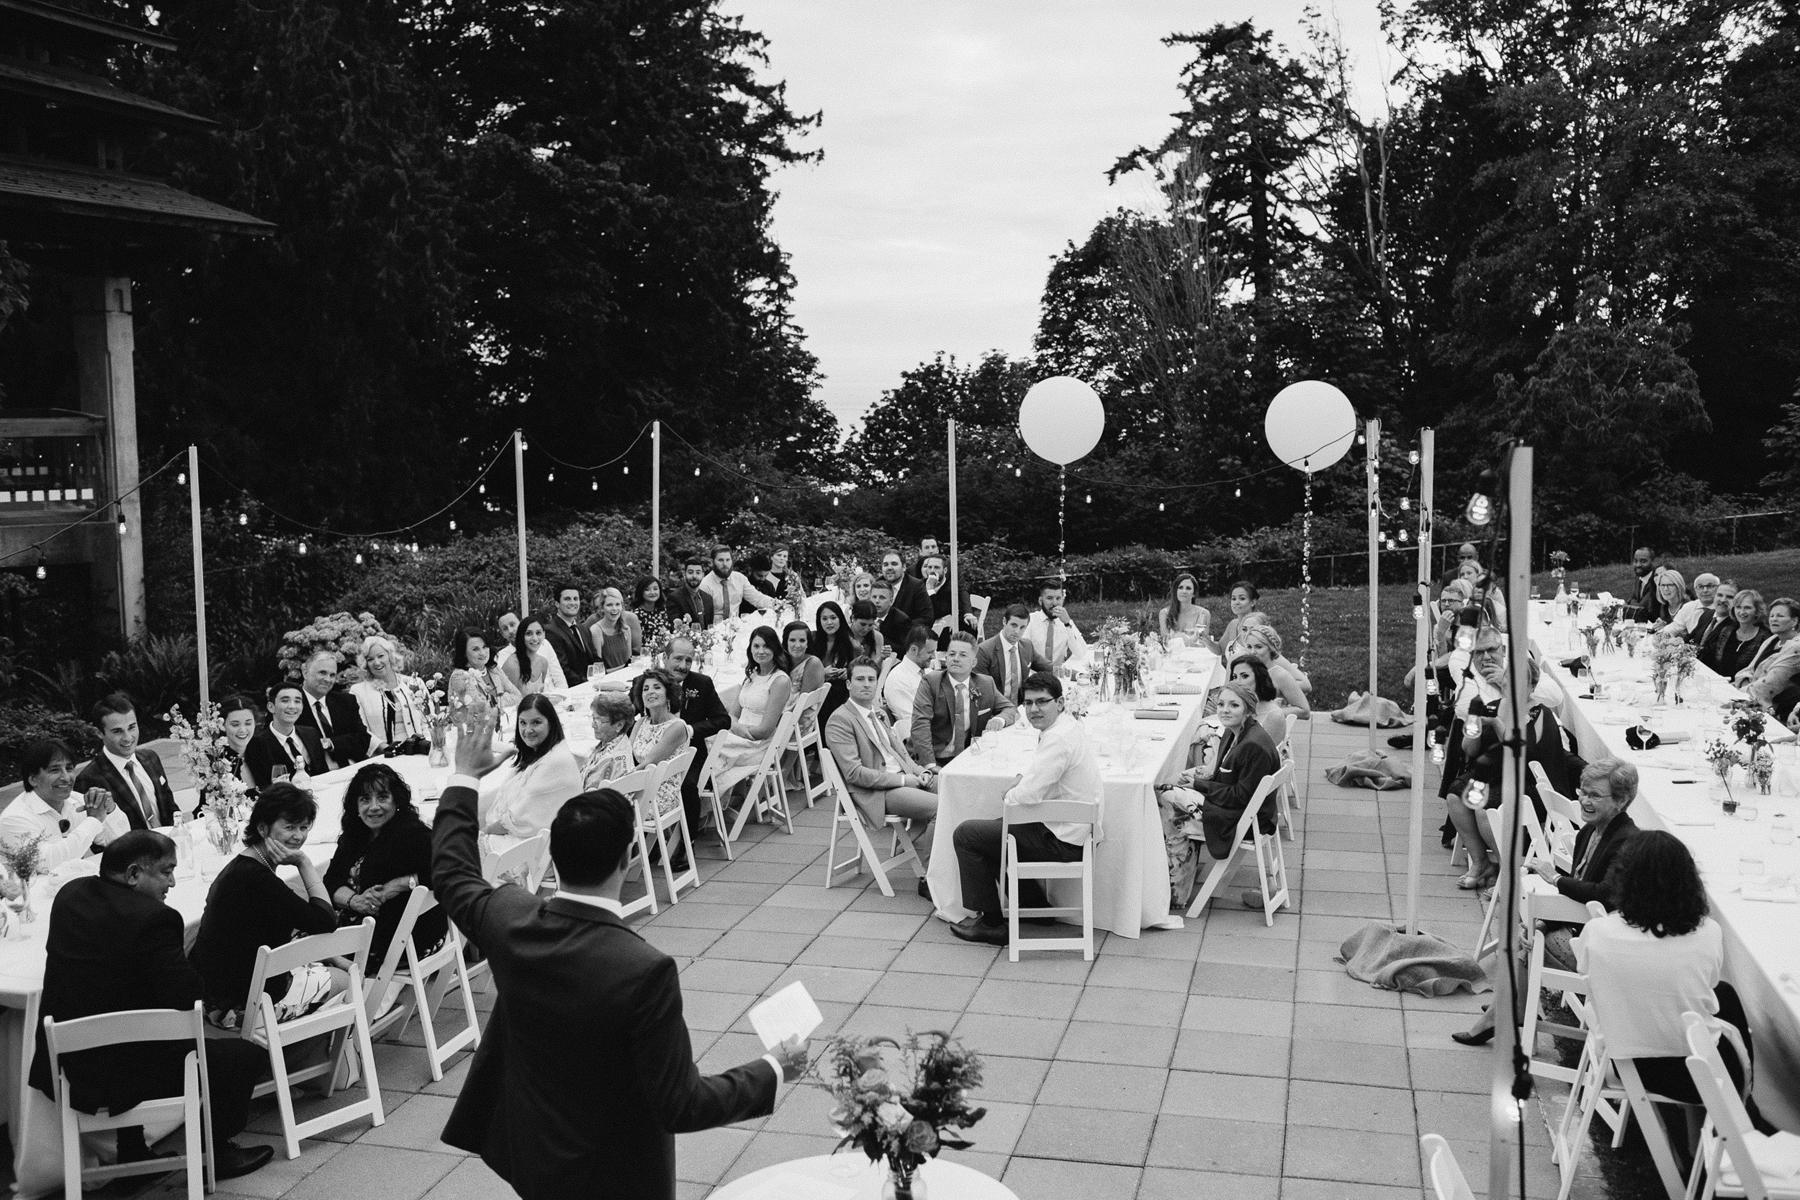 UBC-Botanical-Garden-Wedding-AD-129.jpg